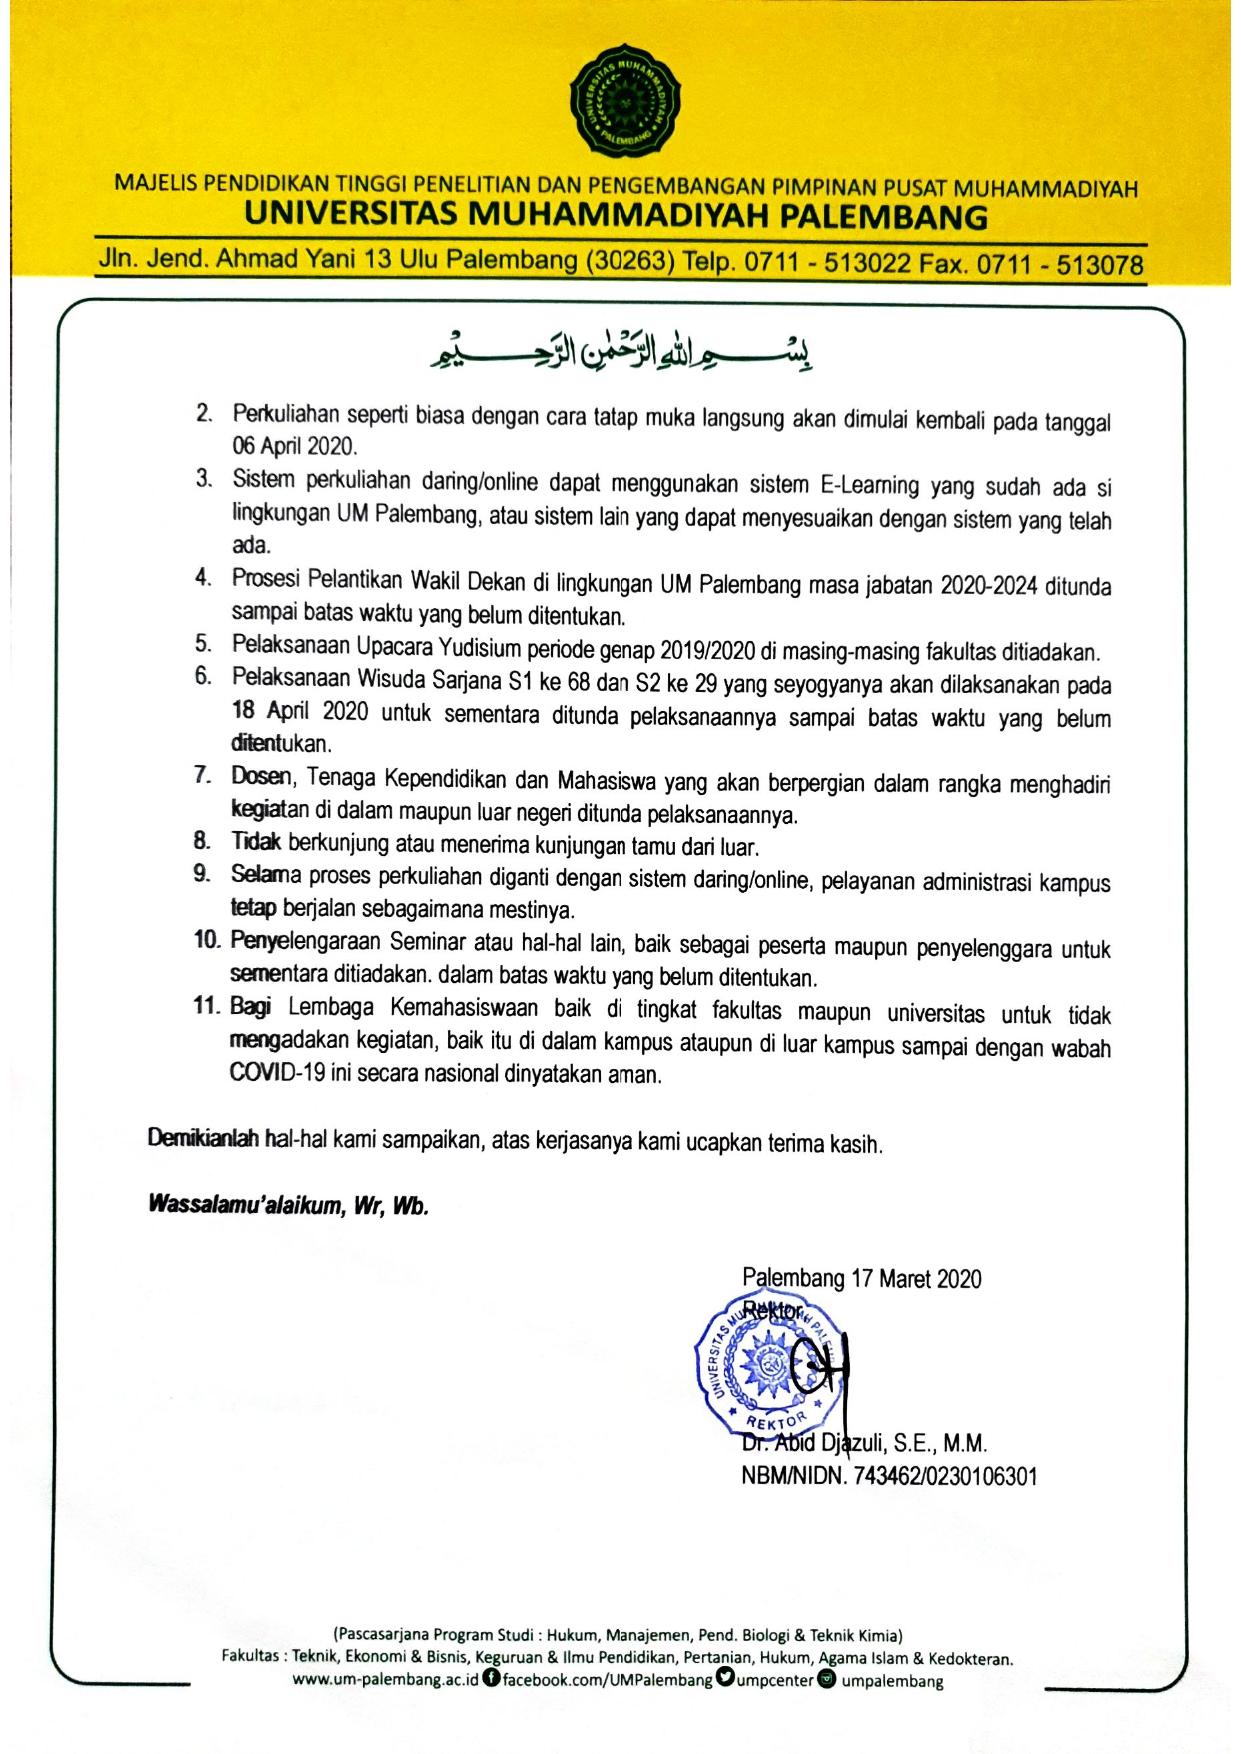 Surat Edaran UMPalembang Terkait Covid-19_page-0002